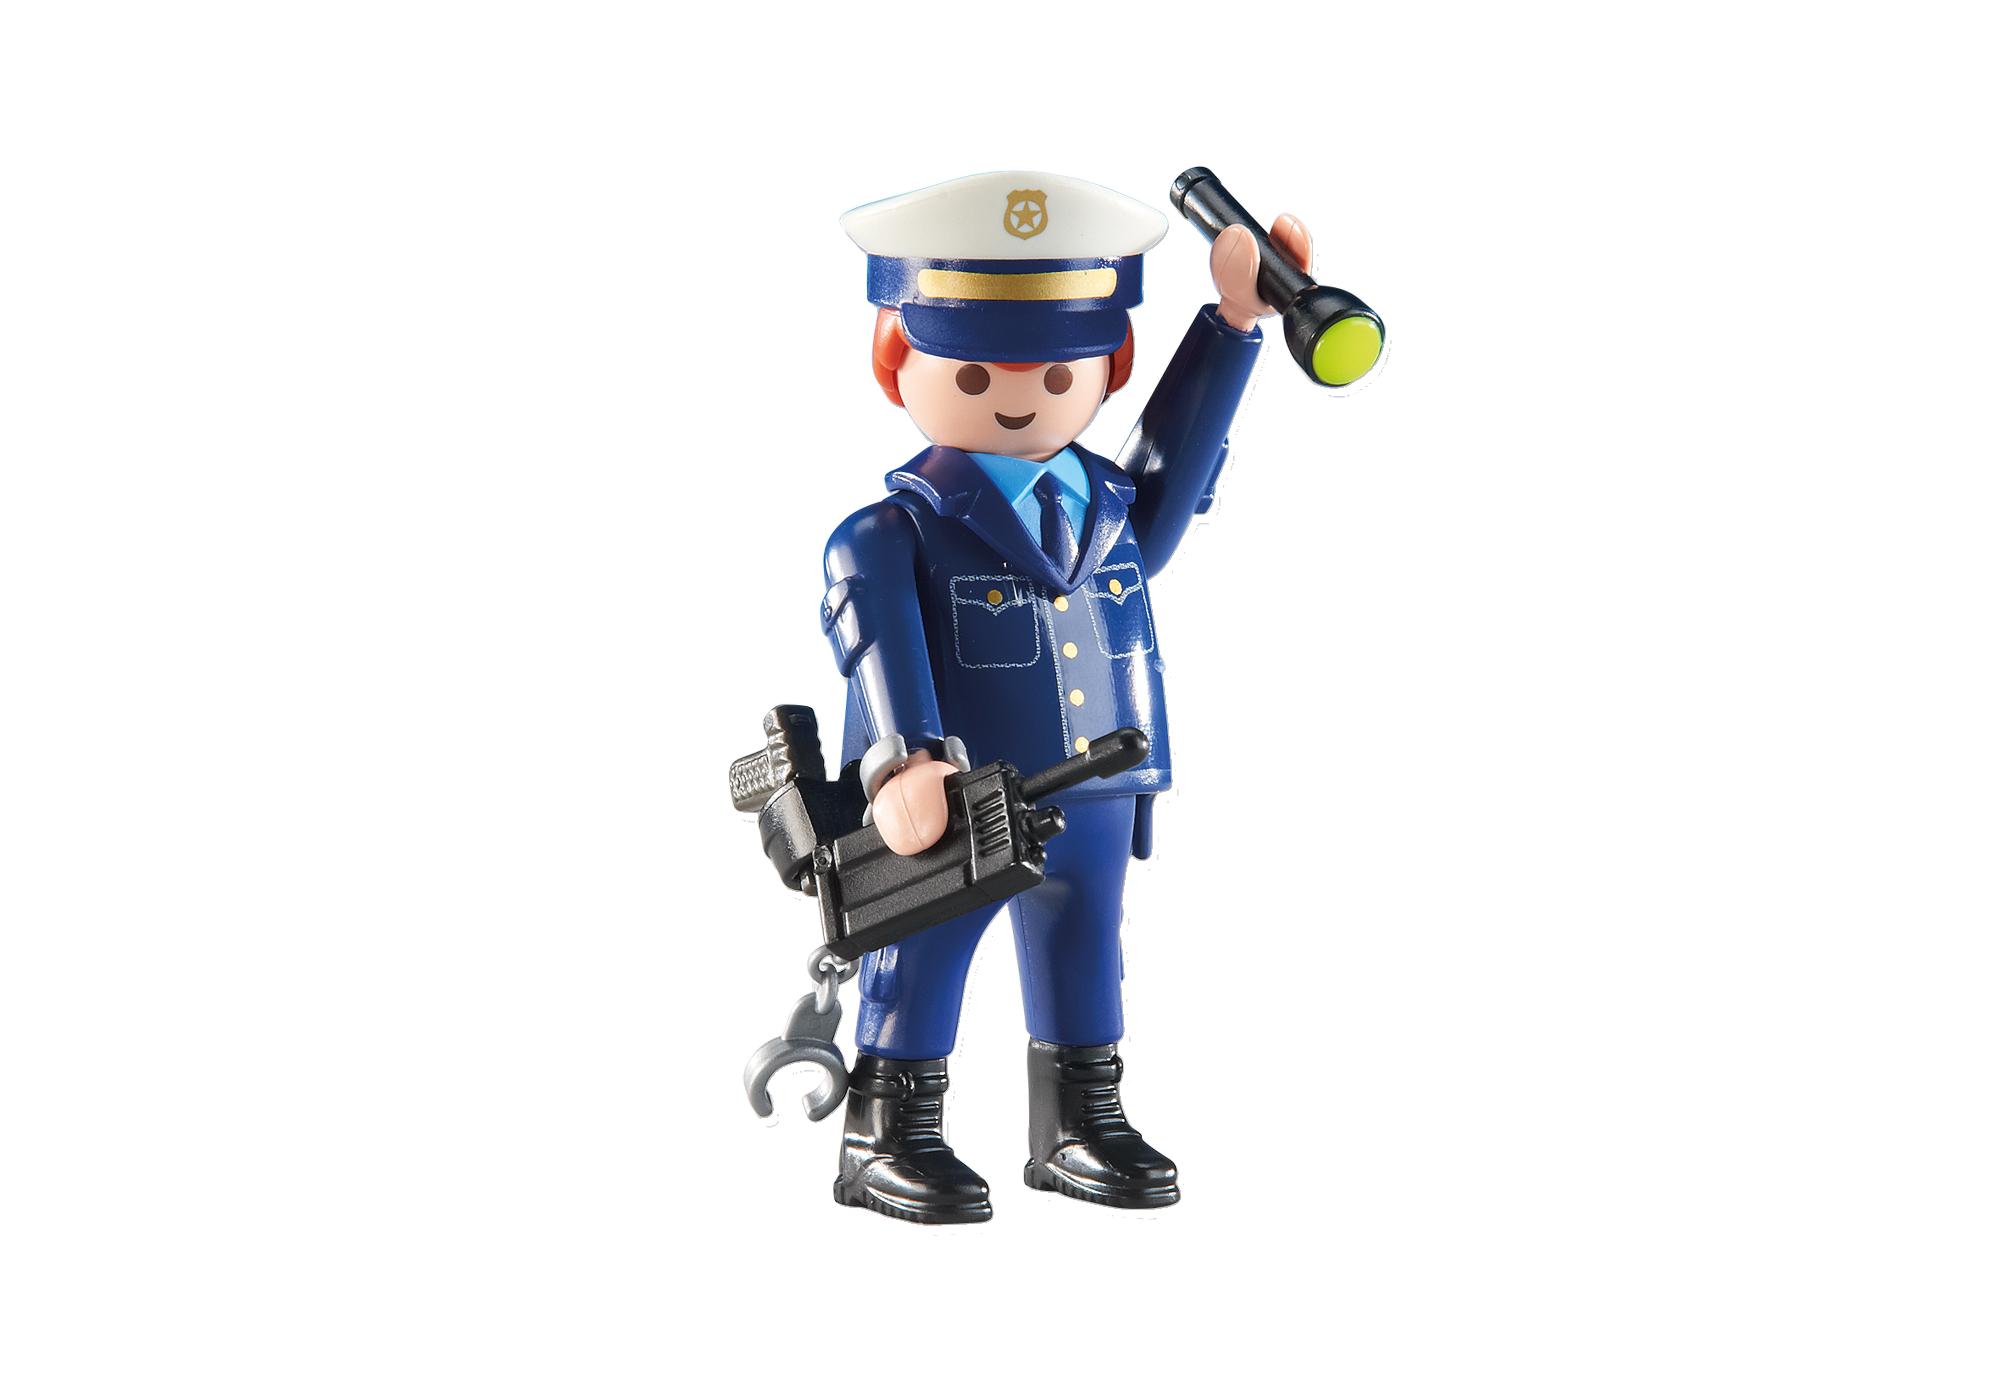 http://media.playmobil.com/i/playmobil/6502_product_detail/Polischef